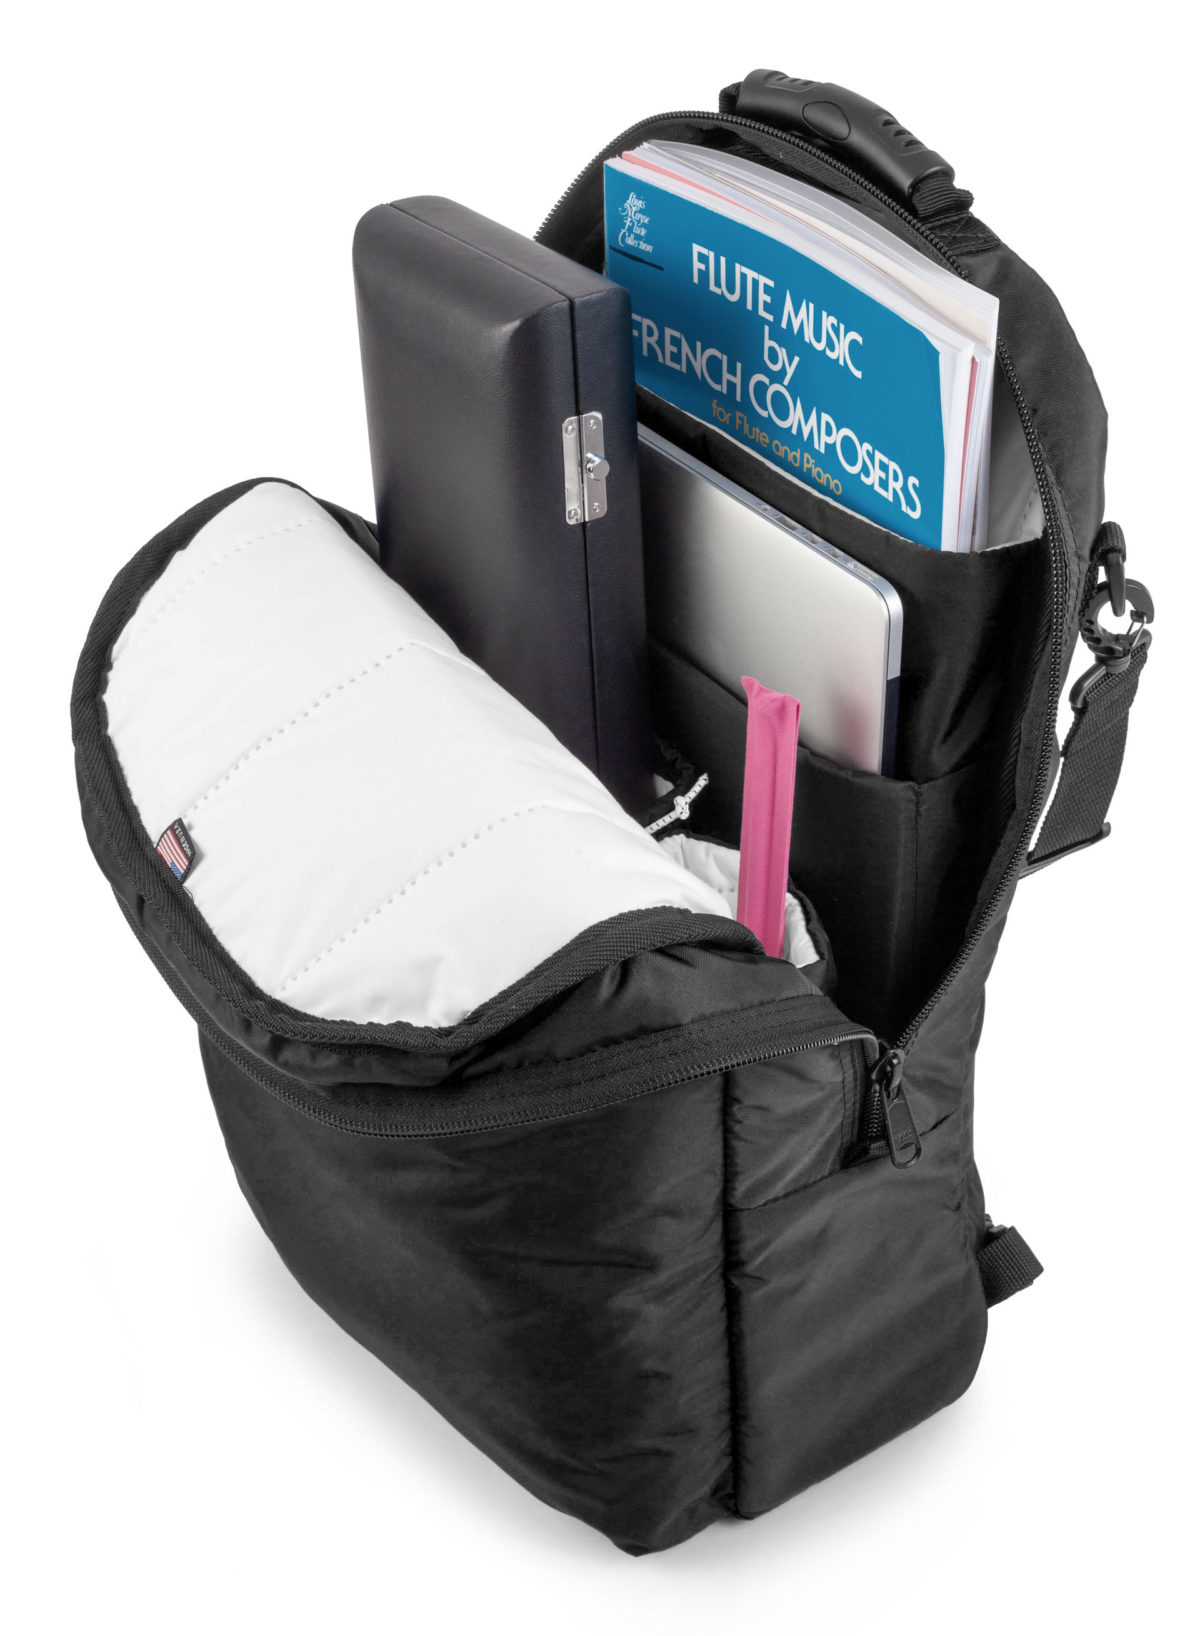 Altieri Alto Flute Backpack Inside View AFBP 00 BK000